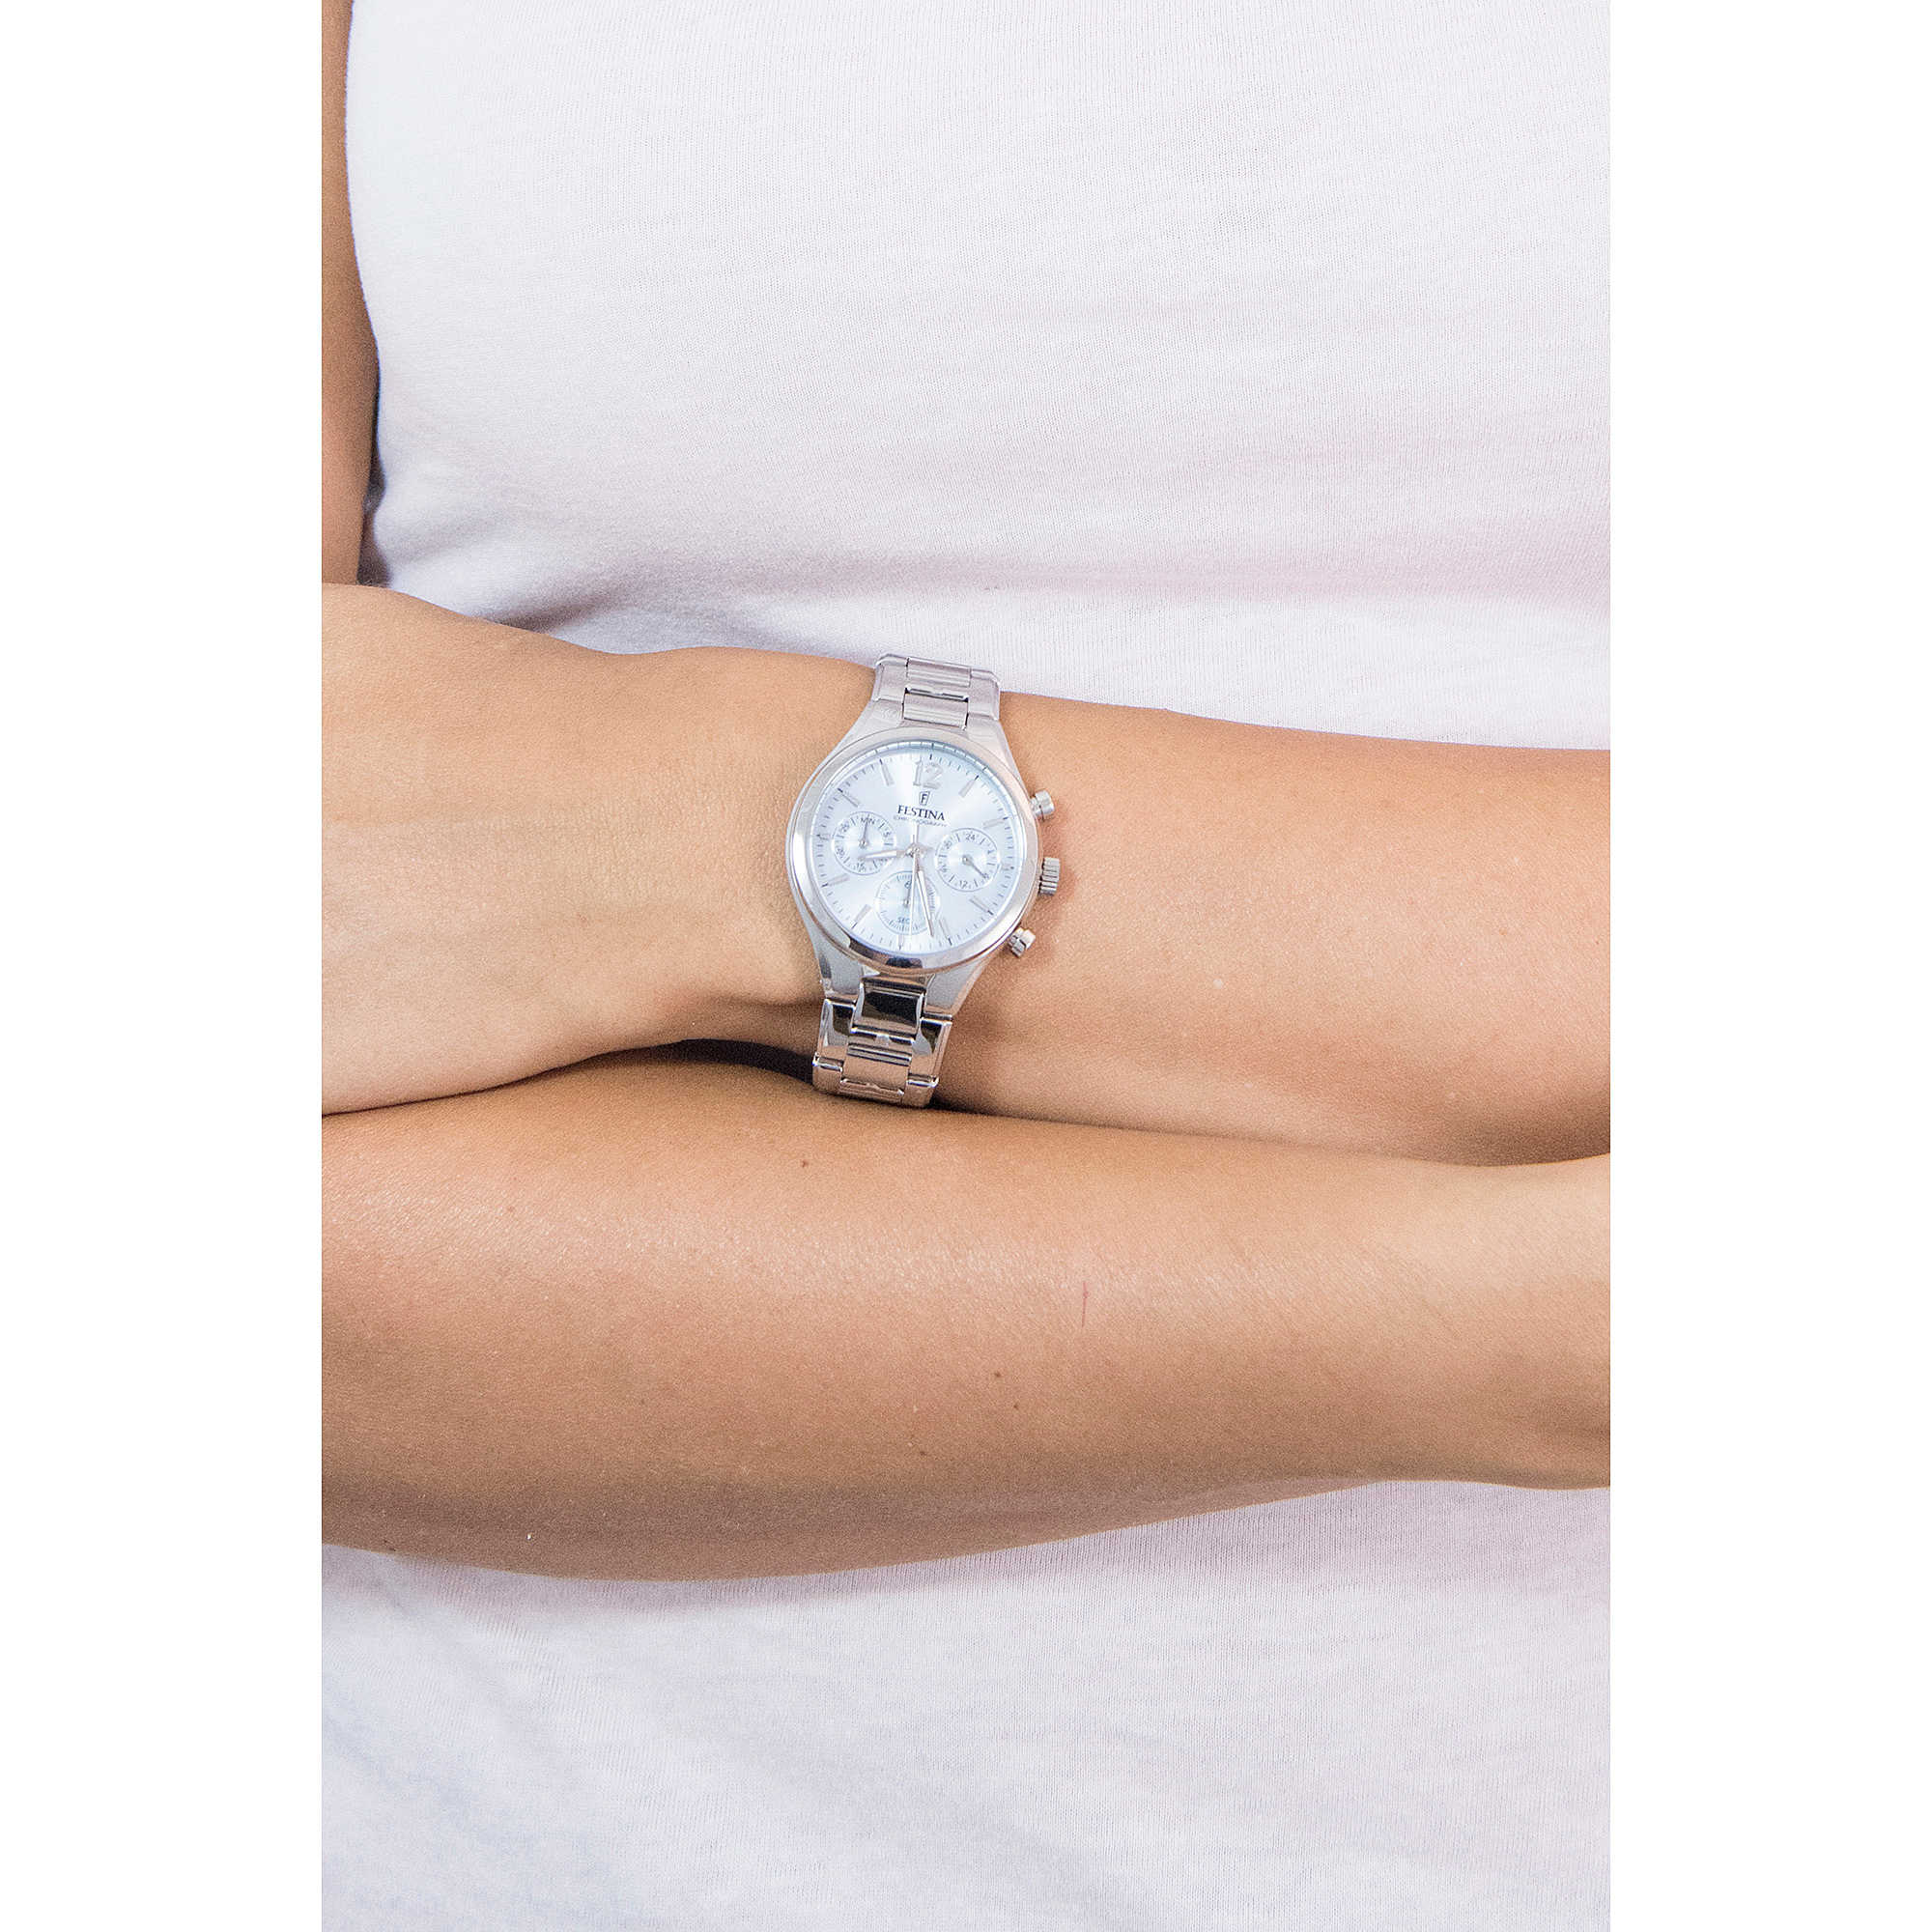 F203913 Frau Chronograph Festina Uhr Boyfriend L3c4RqSAj5